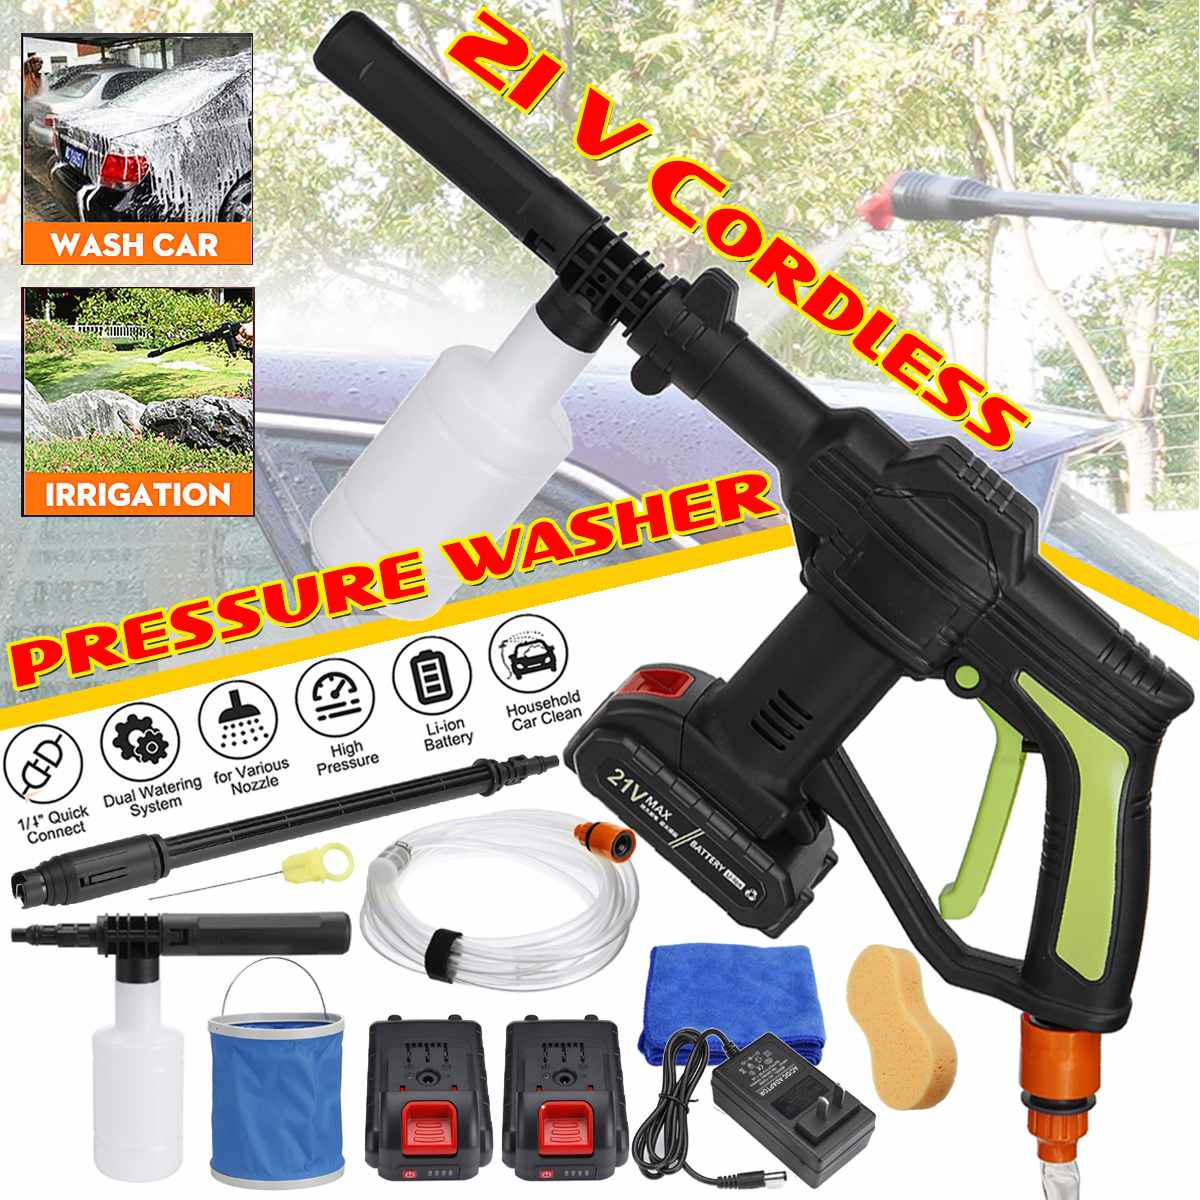 21V Portable Cordless Car Washer Machine High Pressure Electric Water Guns Nozzle Hose Pump Foam Lance Battery Rechargable